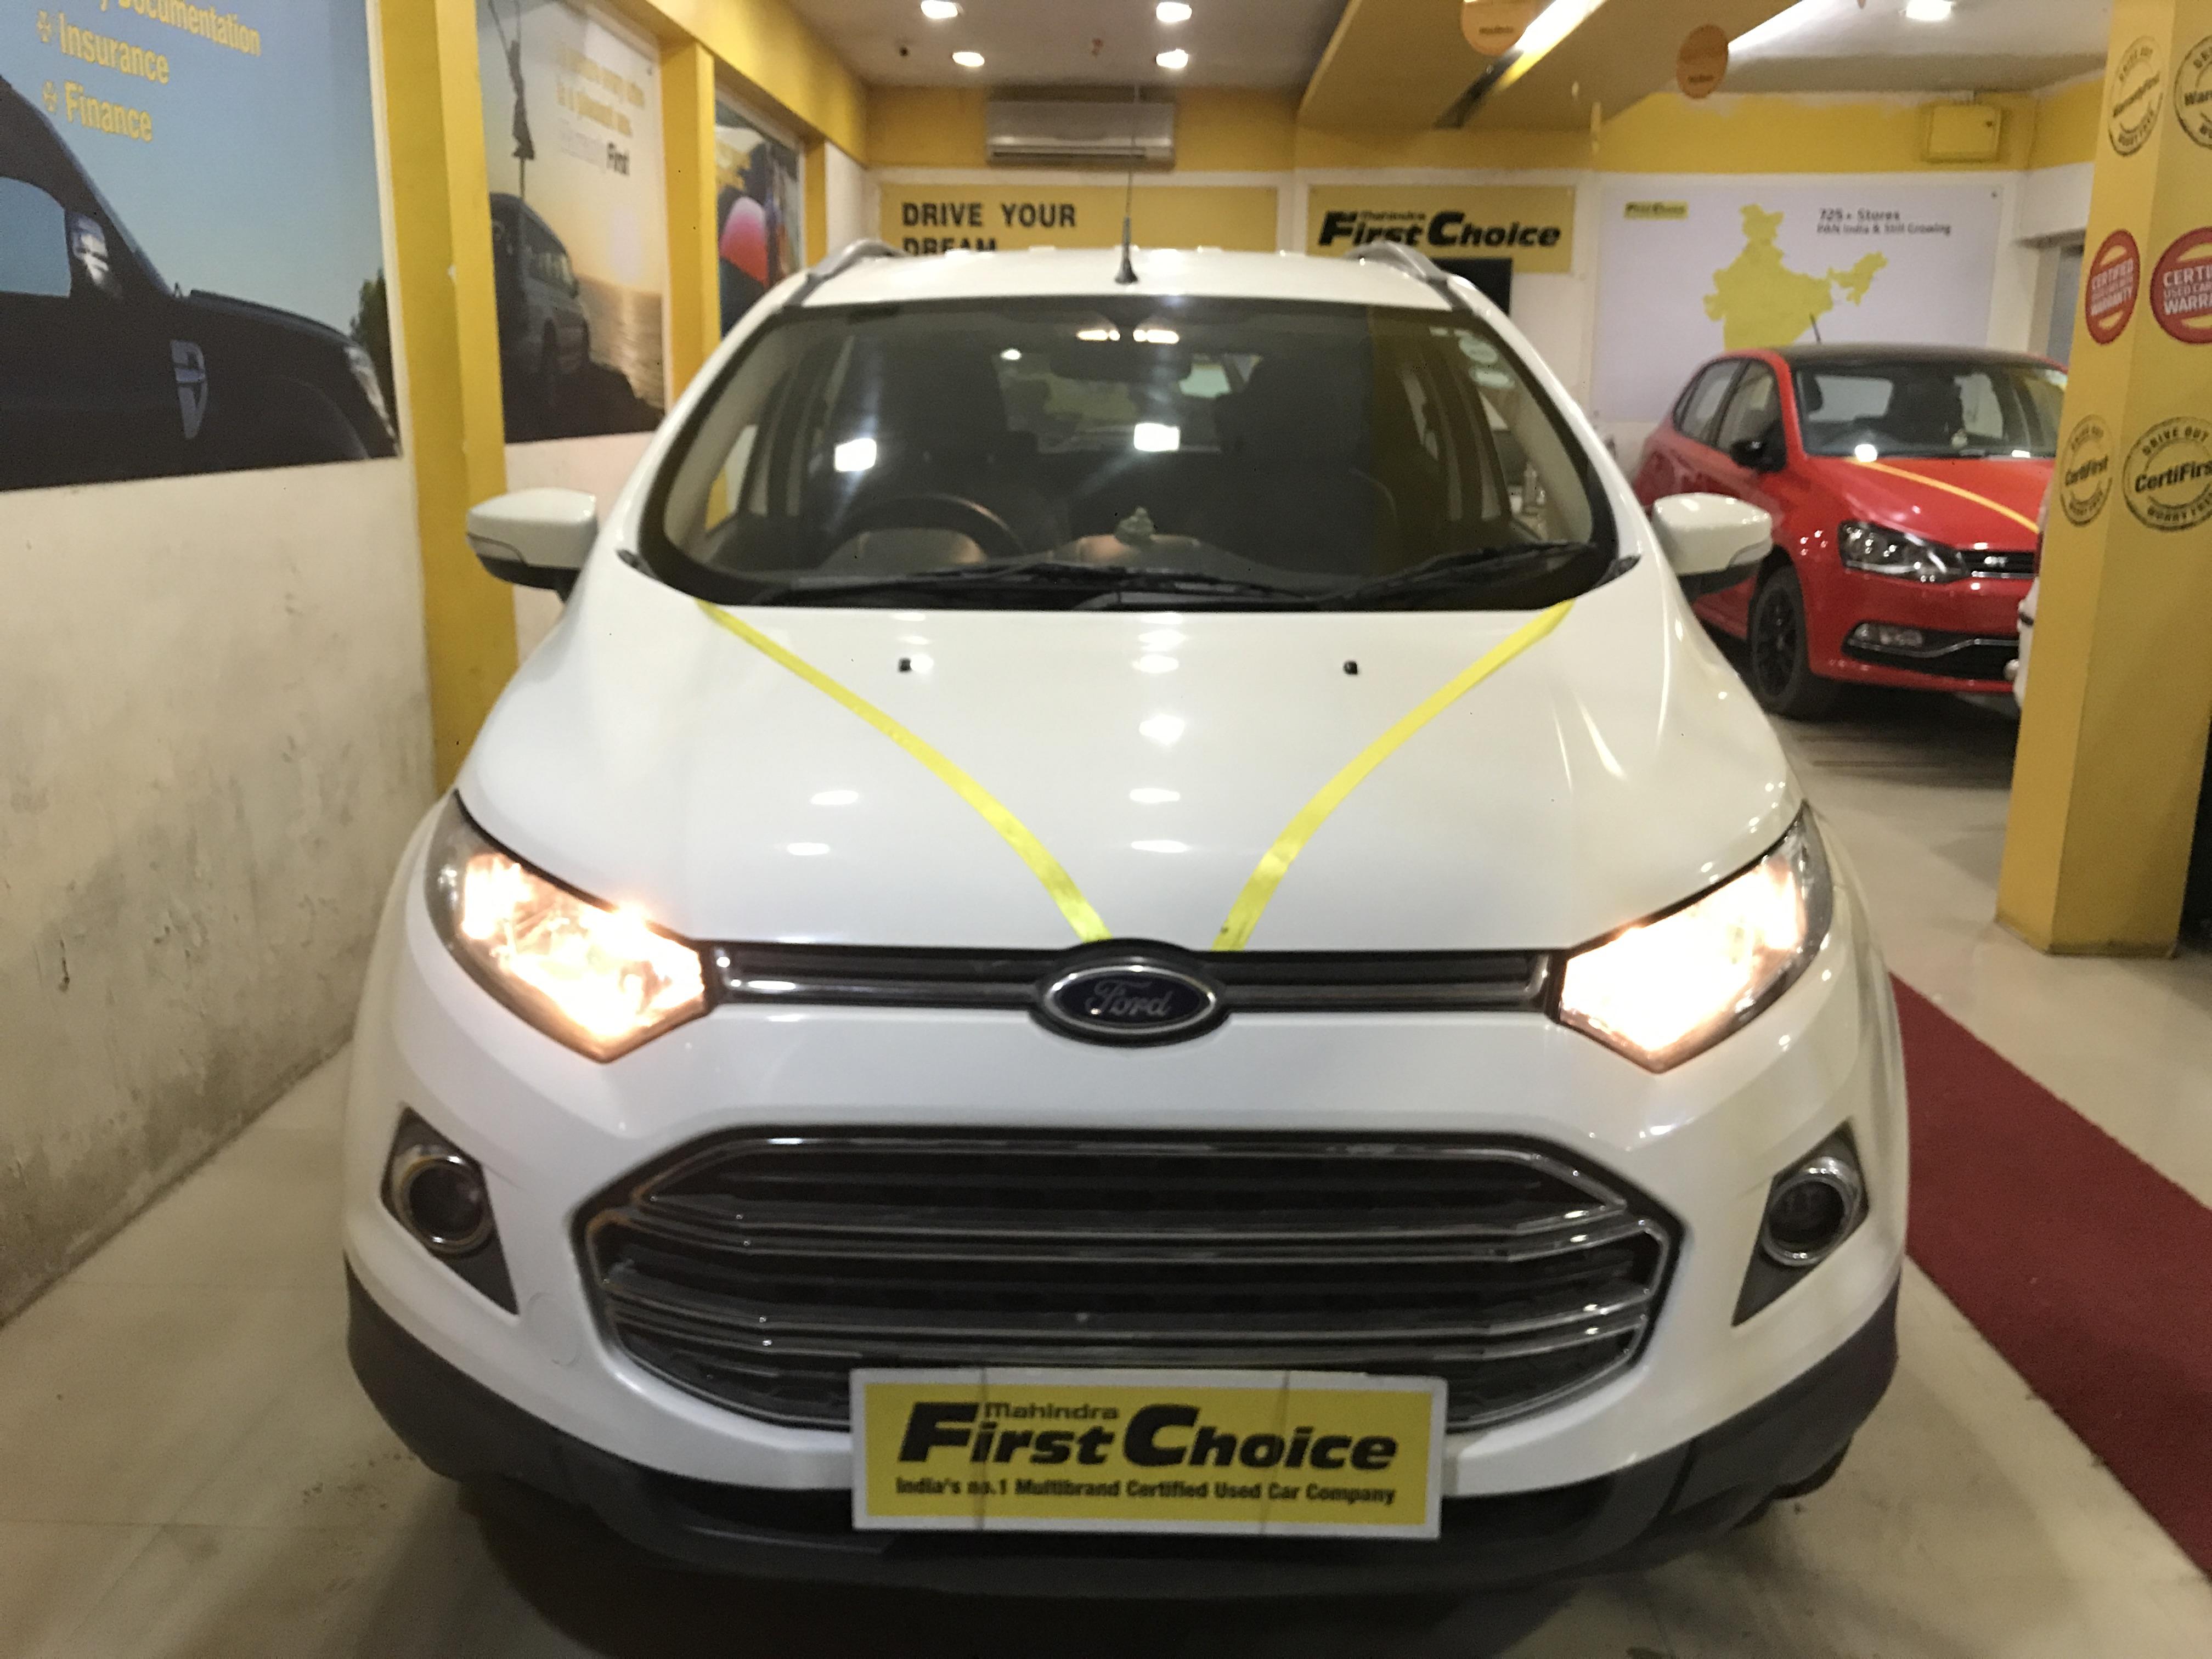 Used Ford in Mumbai Mahindra First Choice